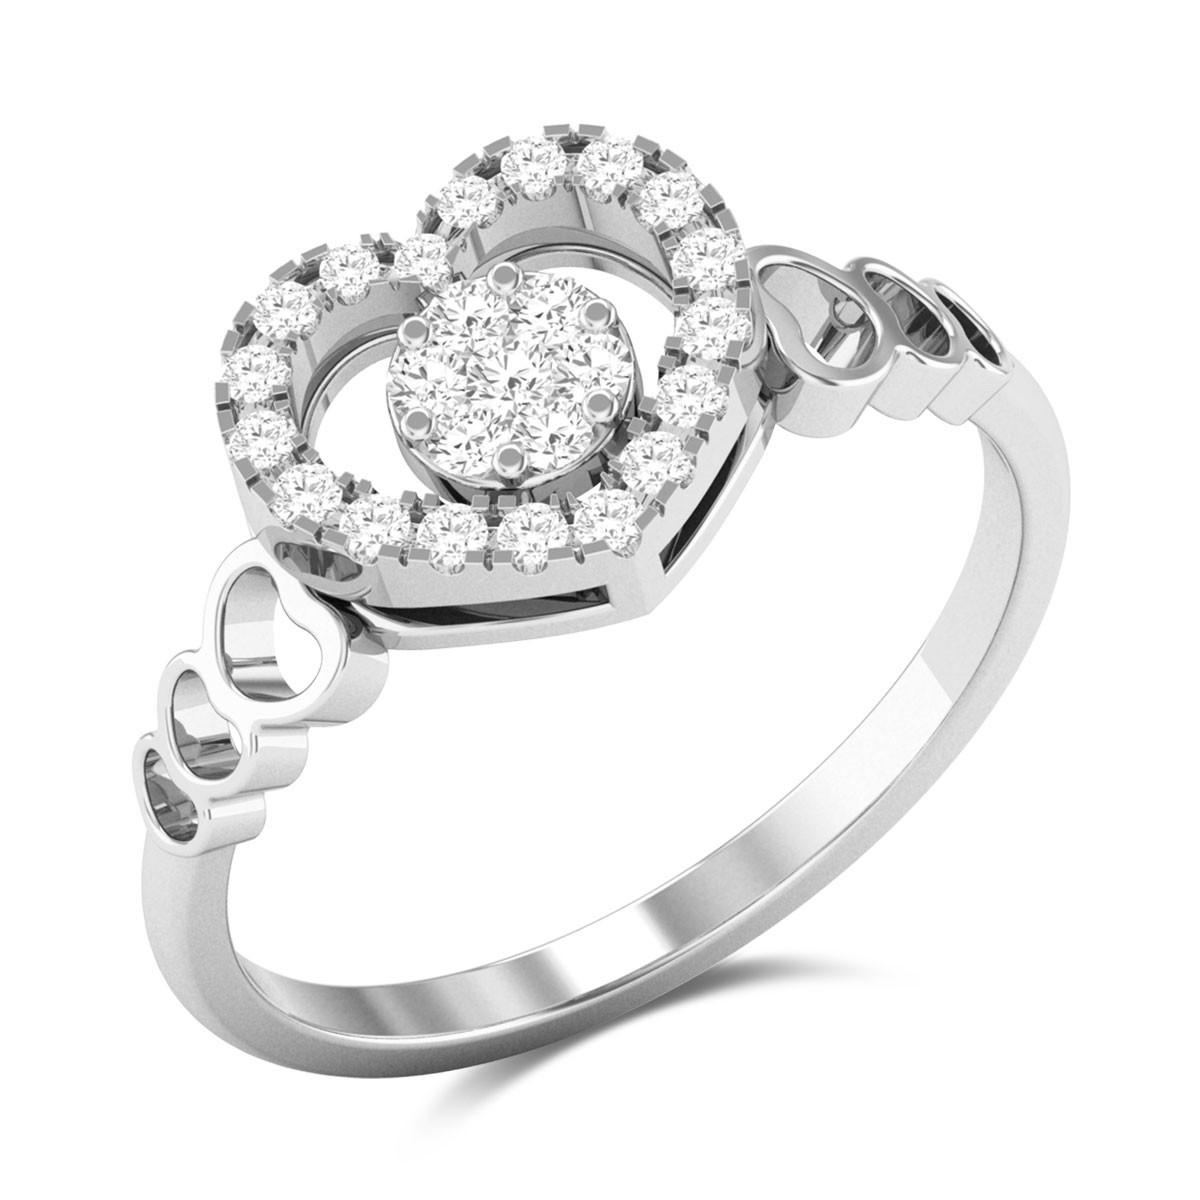 Onassis Heart Diamond Ring